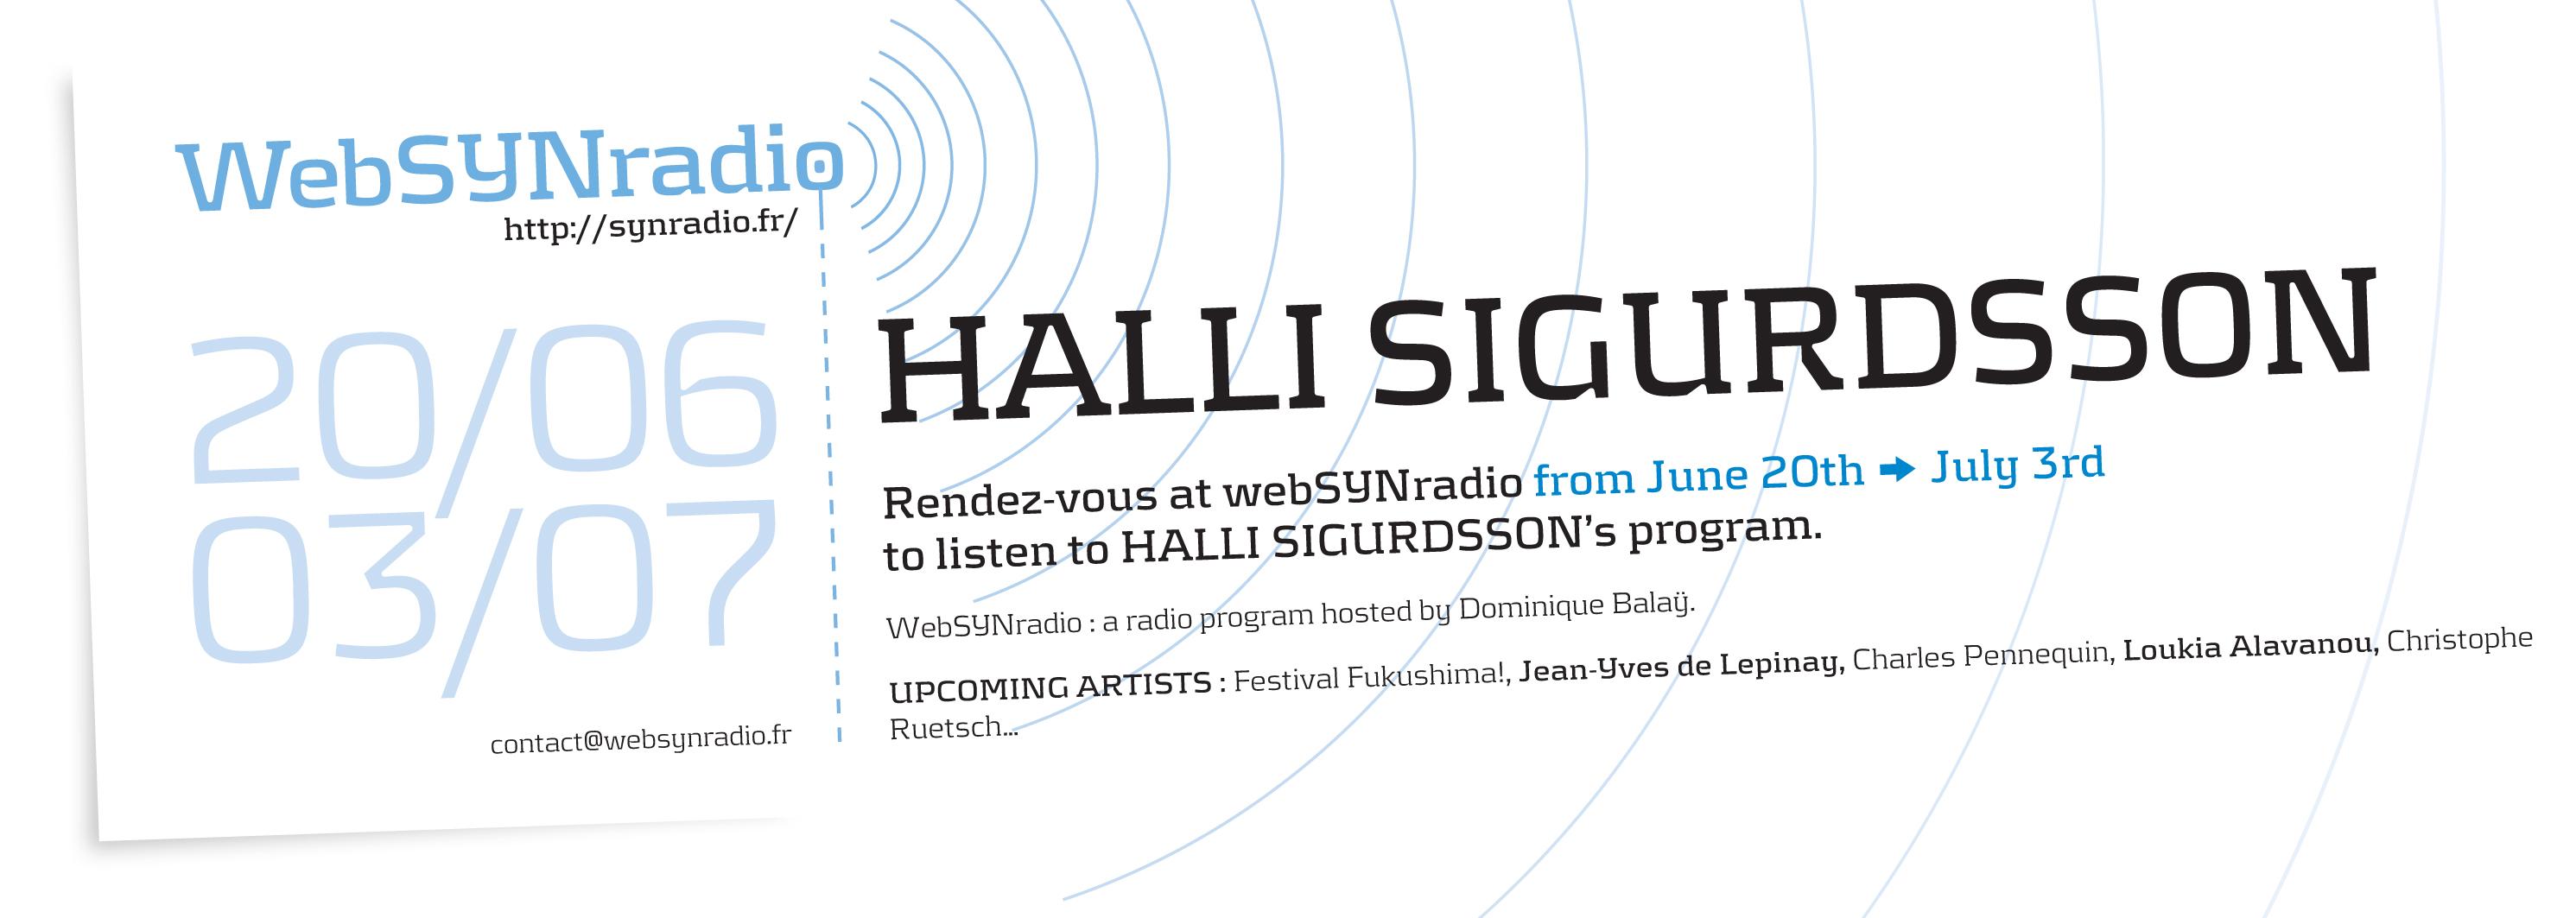 Halli-SIGURDSSON websynradio